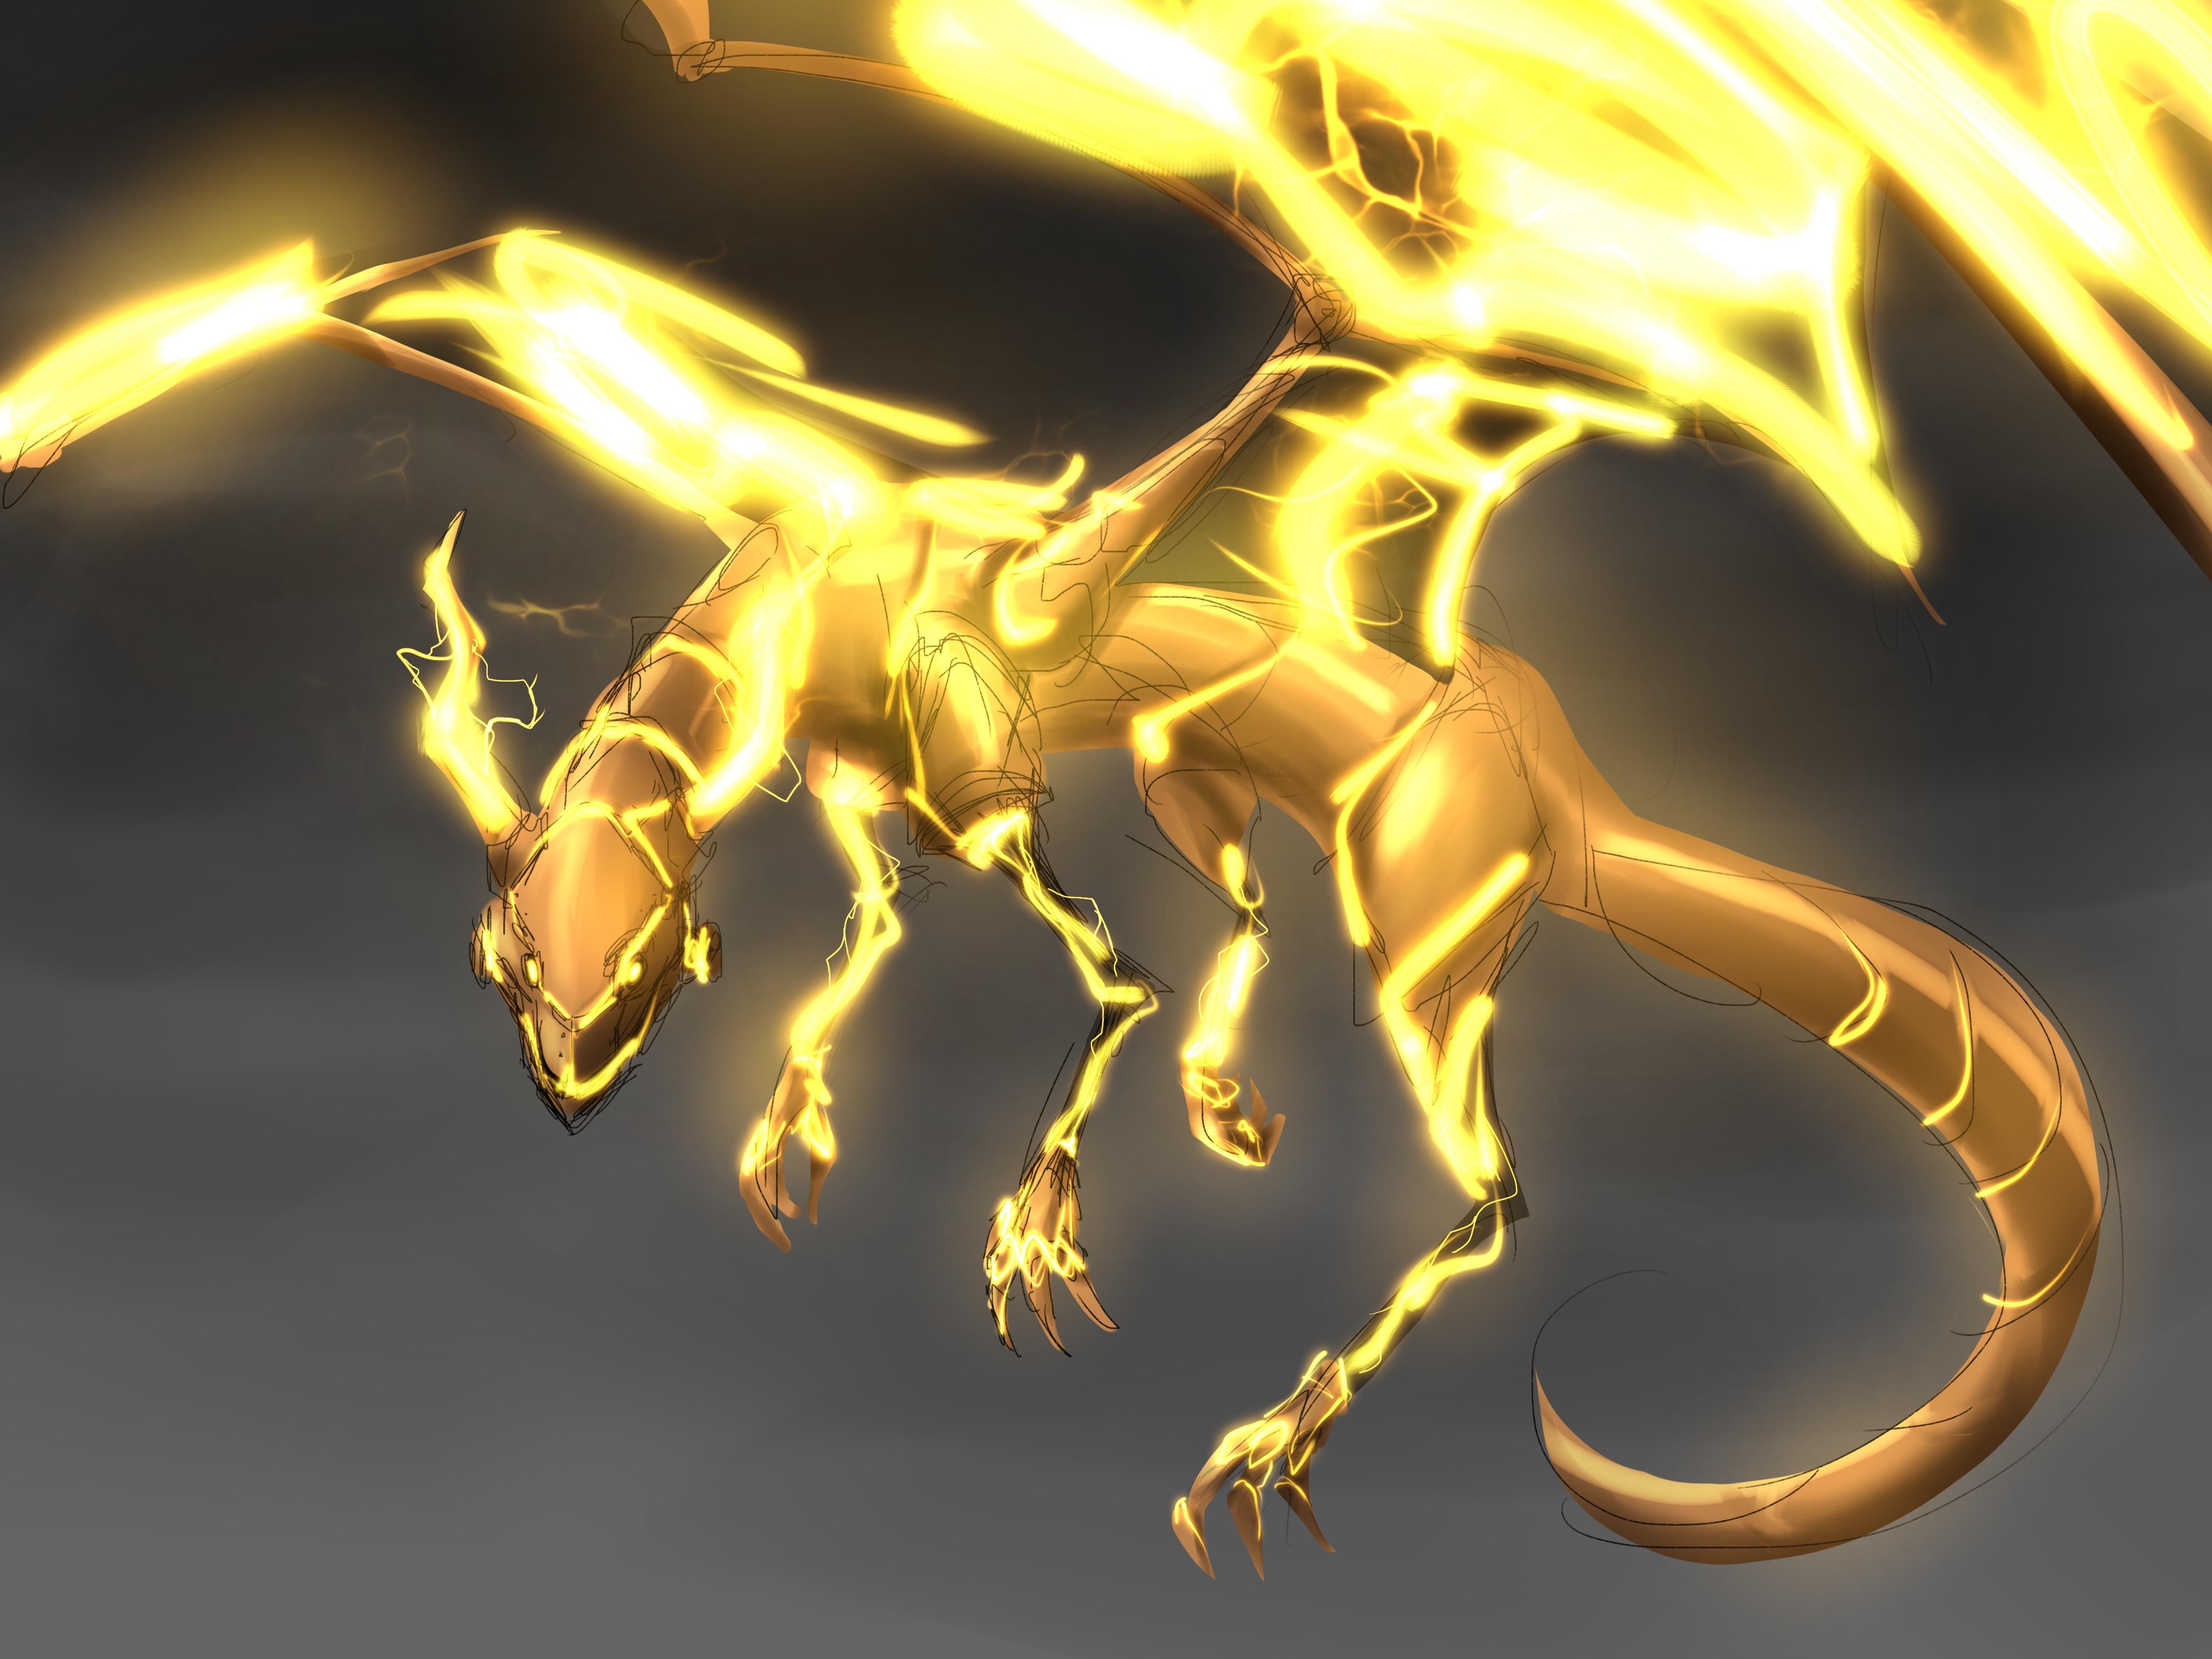 dragon_wx_overload_by_frygia-dcjwma0.jpg